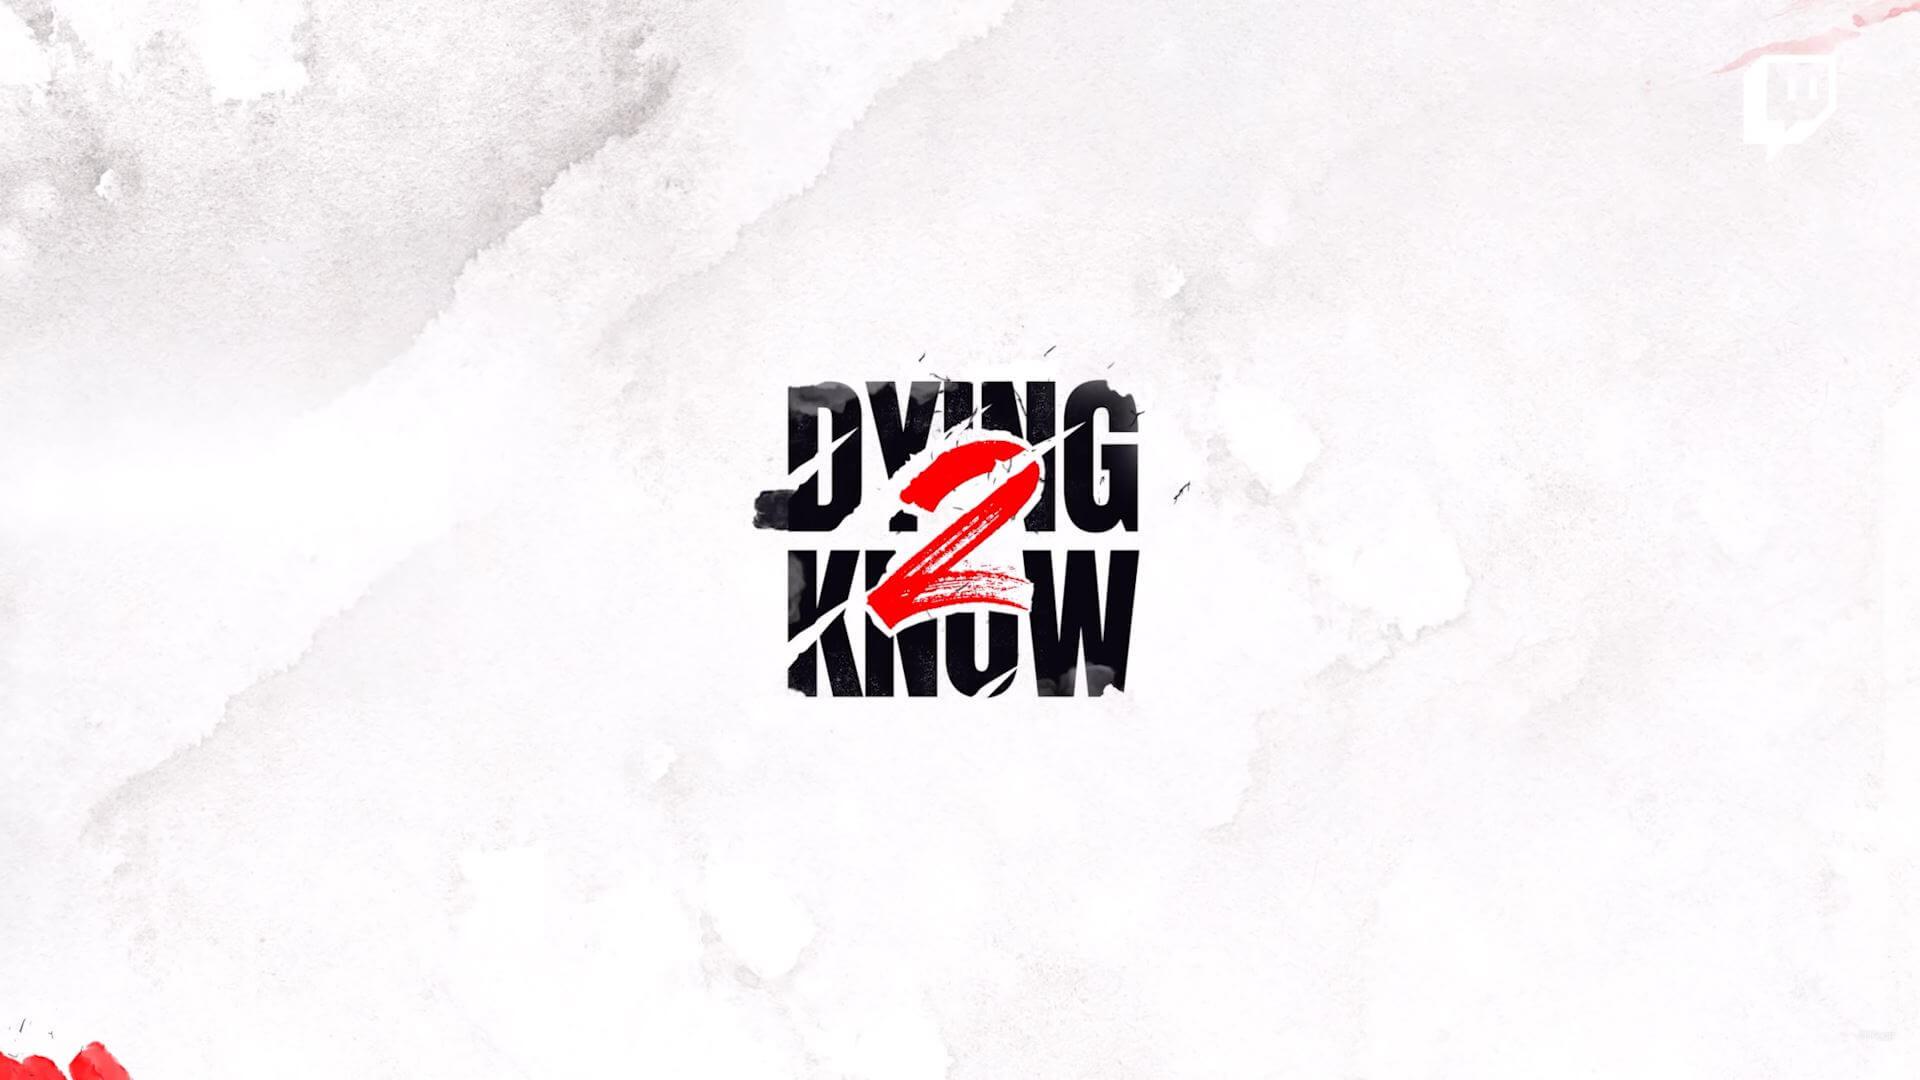 Dying 2 Know è la livestream dedicata a Dying Light 2 Stay Human.